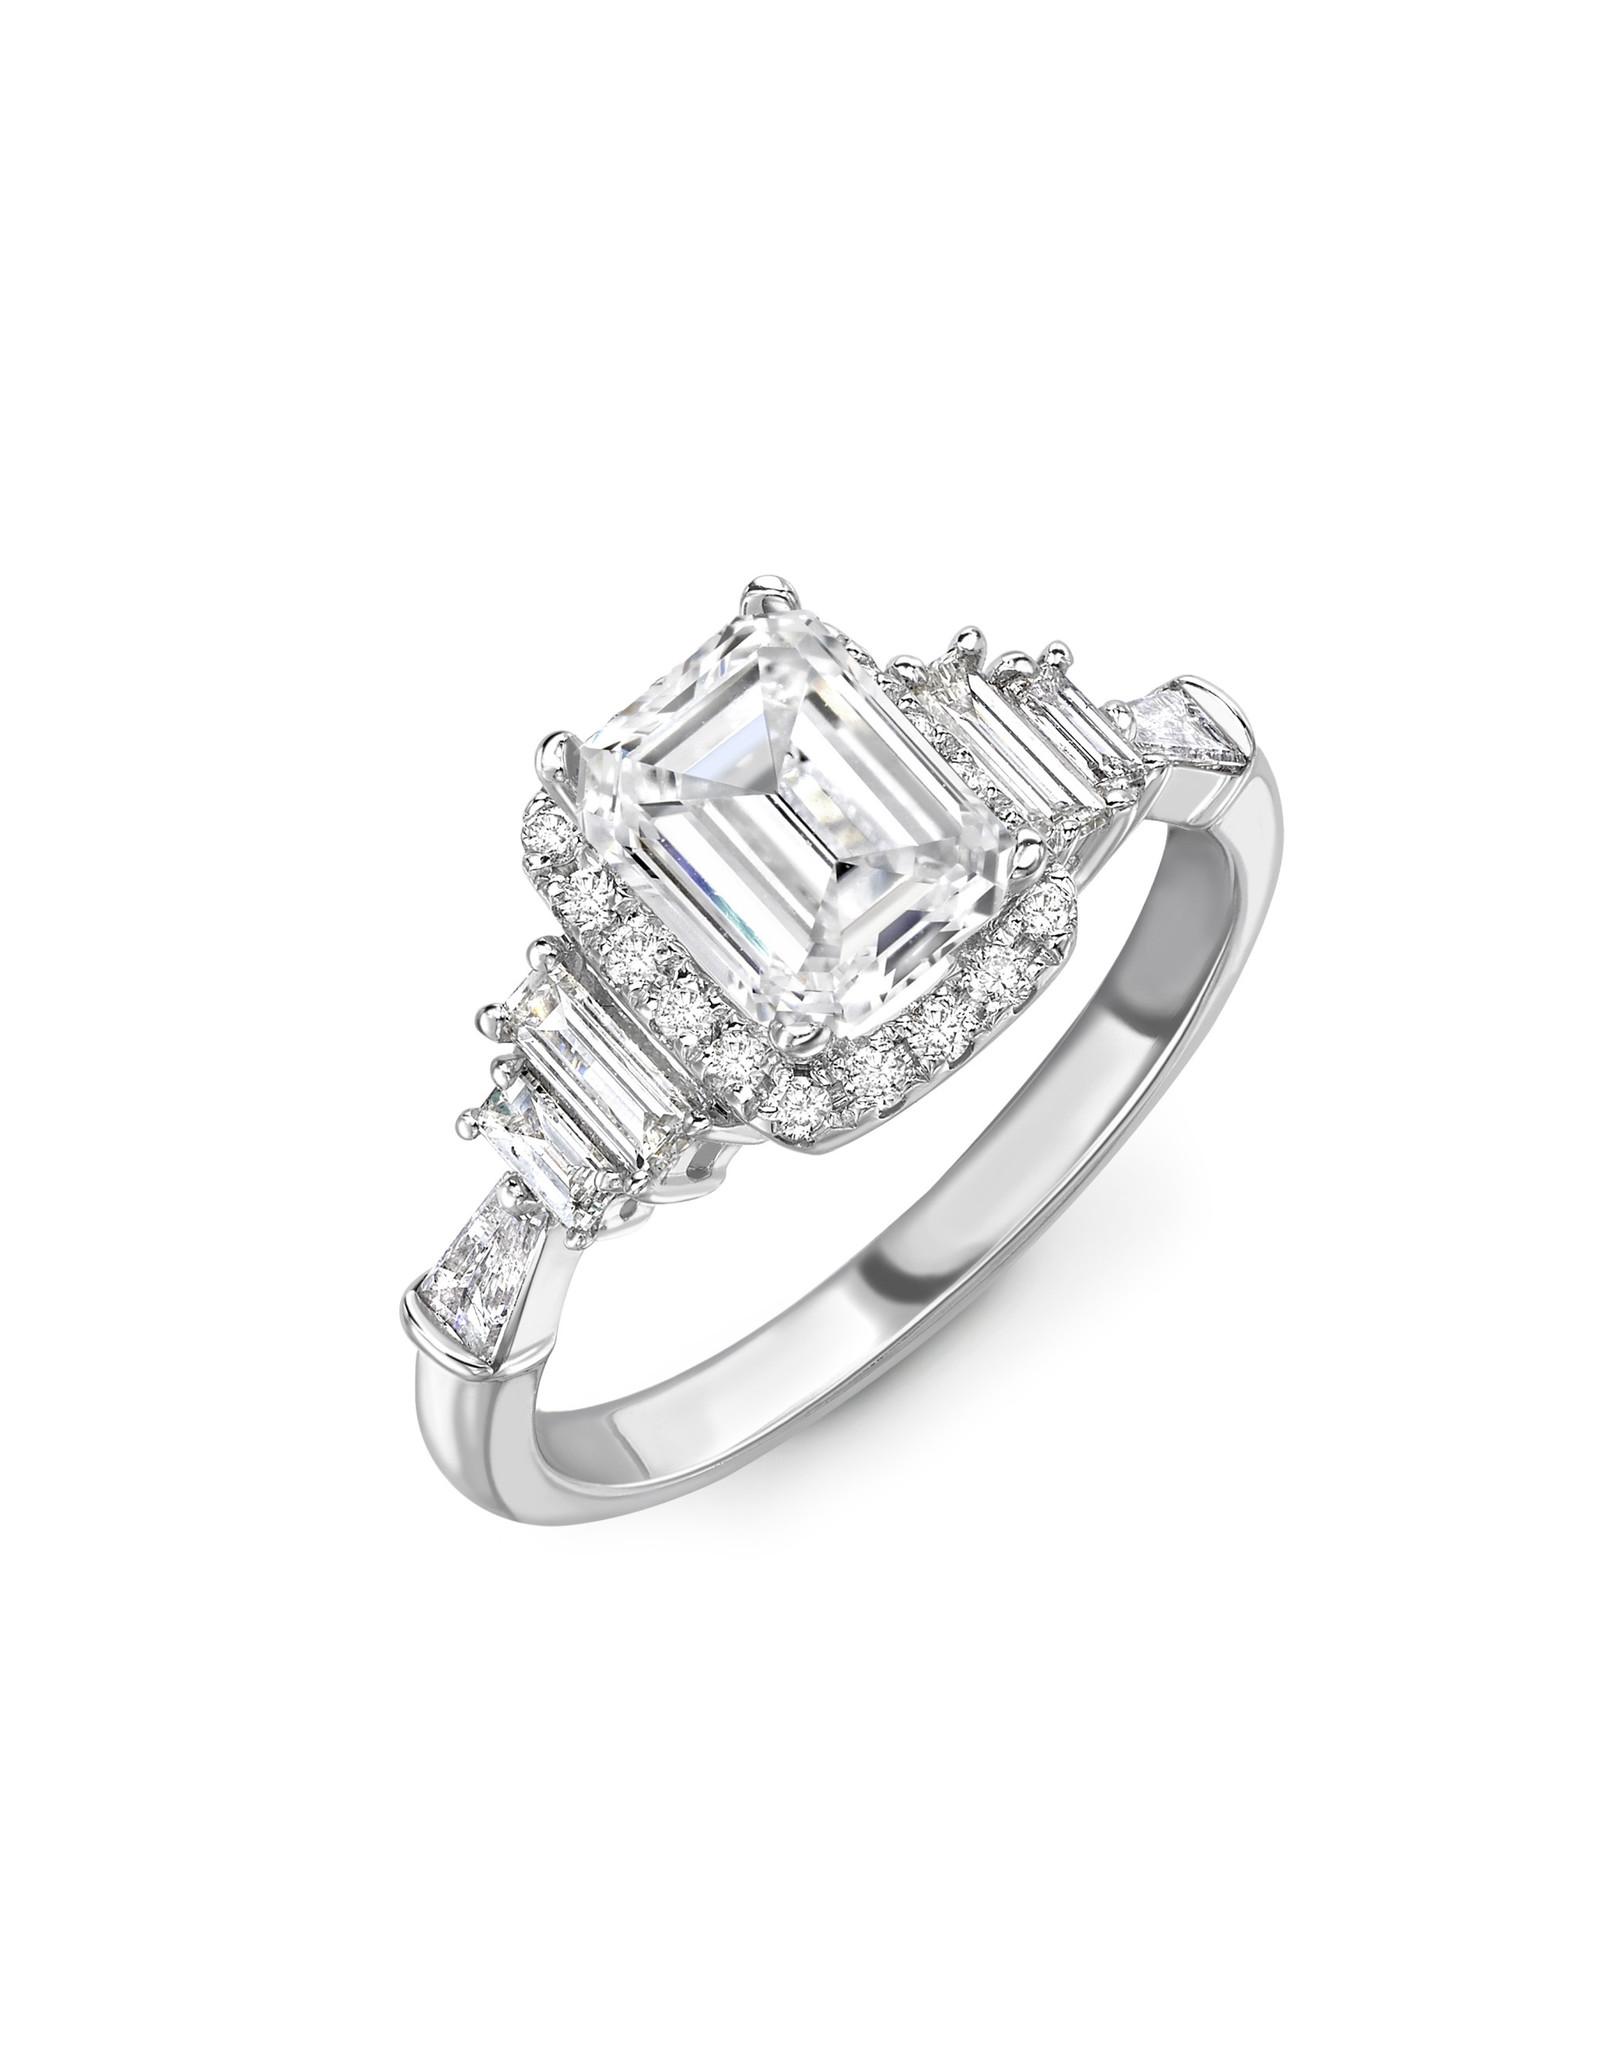 LVN Emerald Cut Exclusive Verlovingsring LVNRX4717